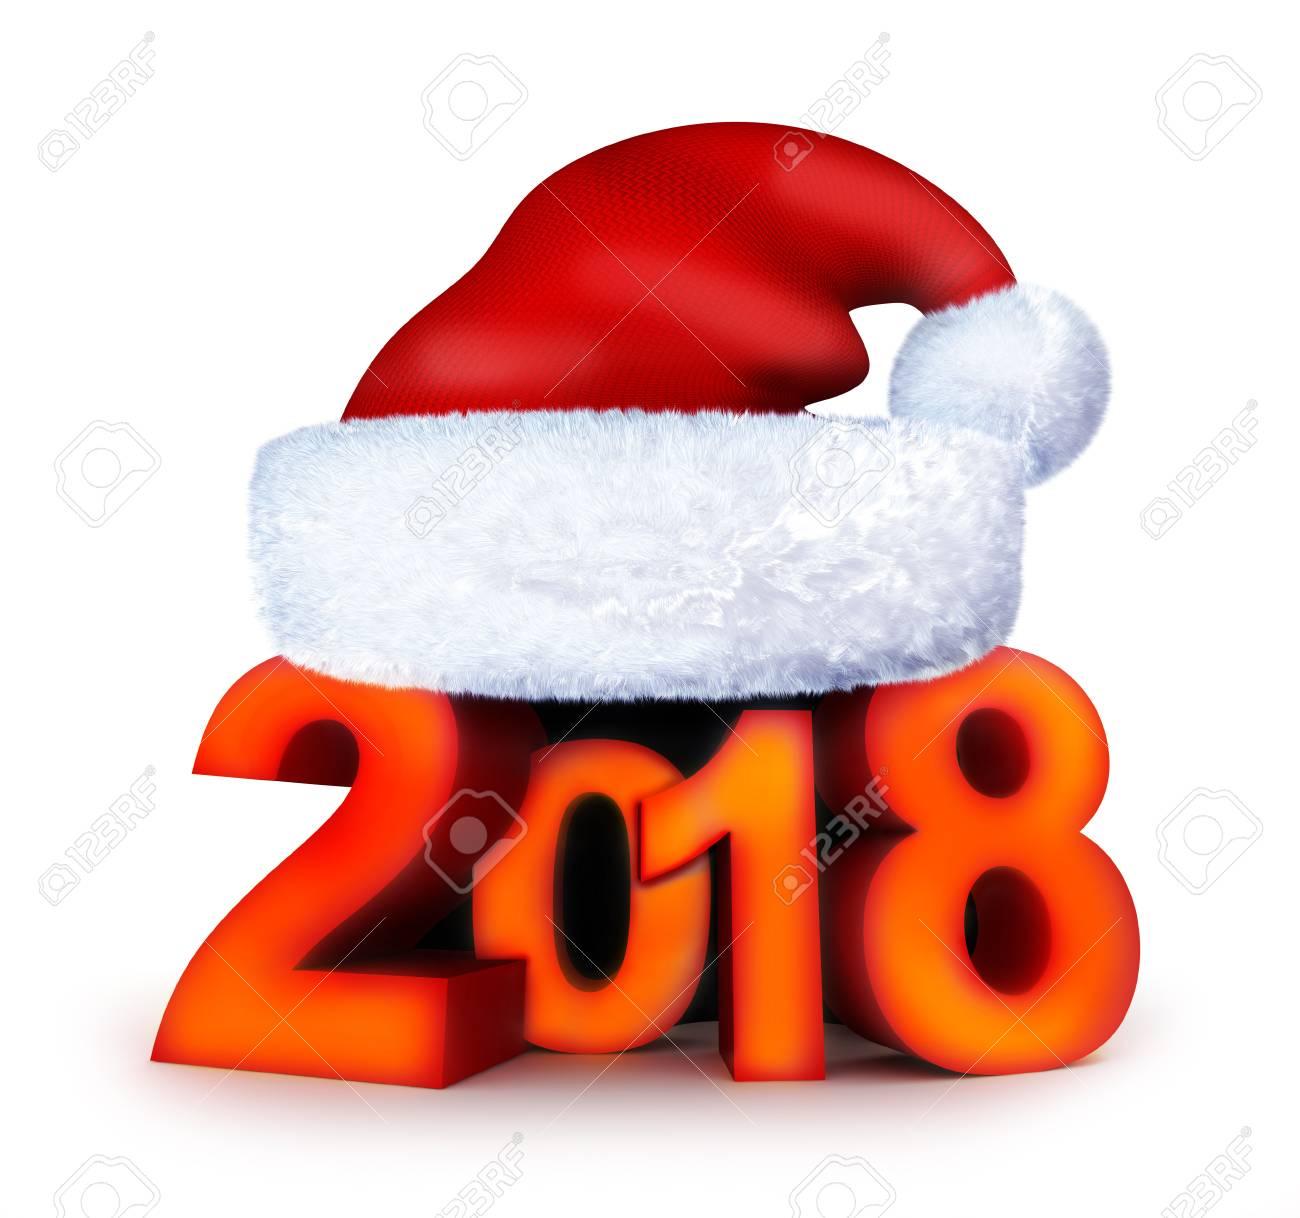 illustration new year 2018 and santa cap 3d illustration